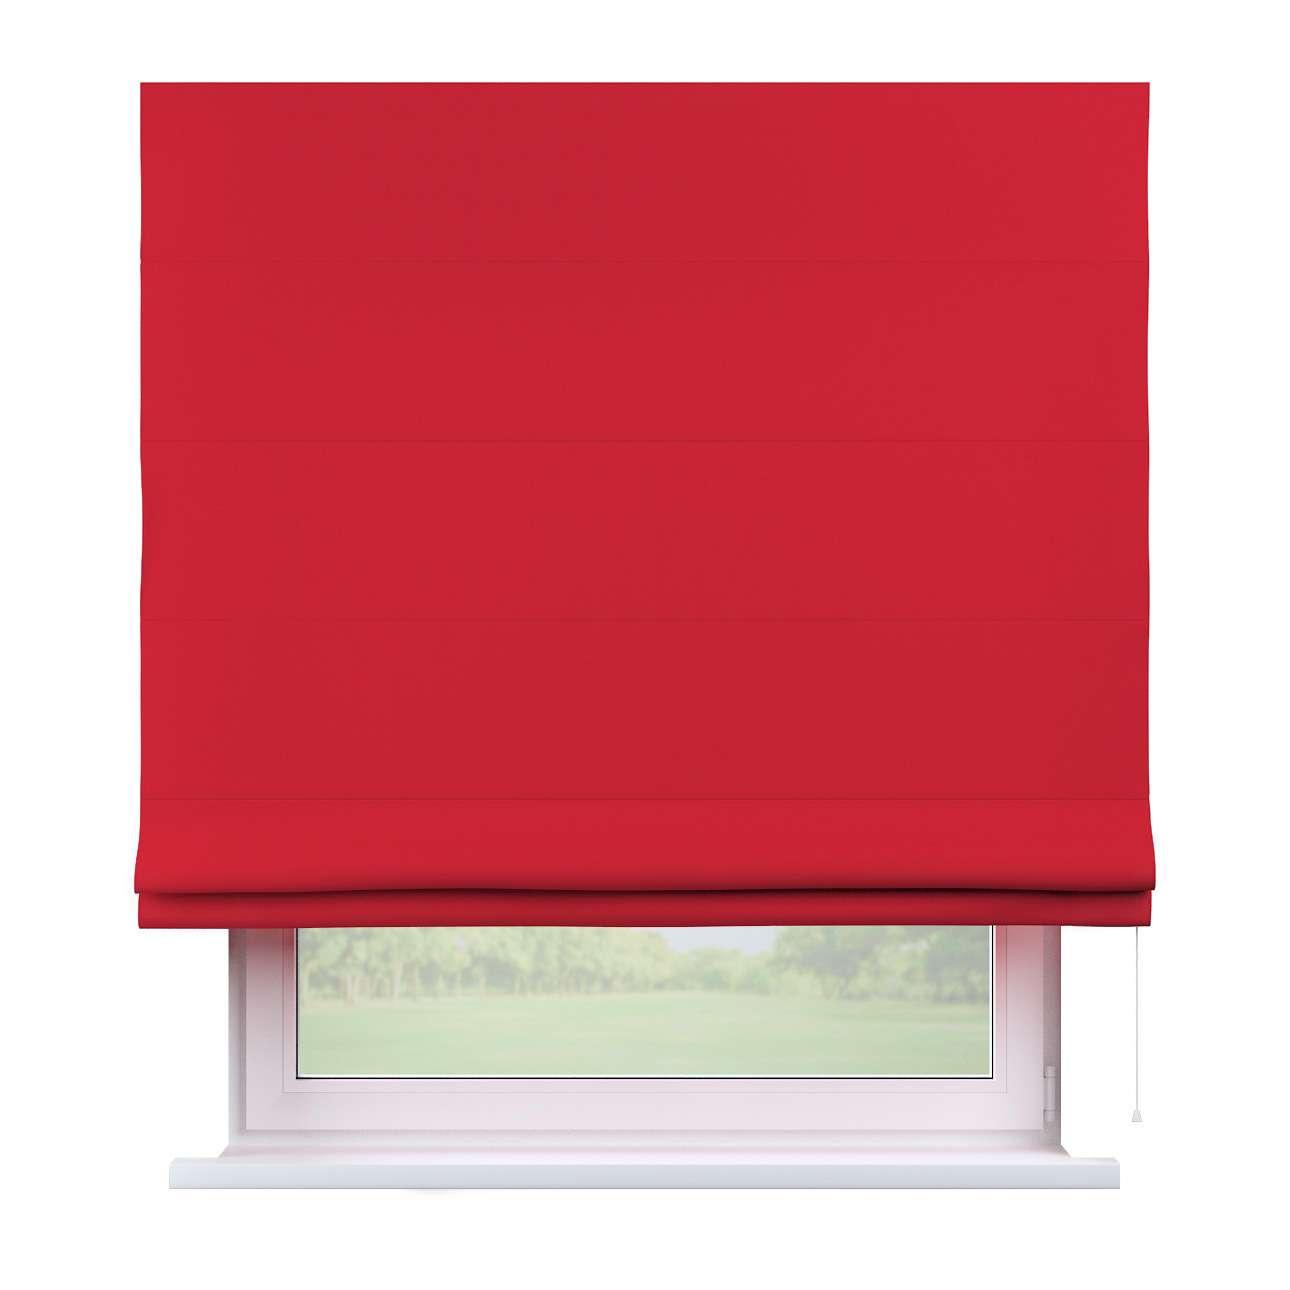 Raffrollo Capri, rot, 160 × 170 cm, Cotton Panama   Heimtextilien > Jalousien und Rollos > Raffrollos   Dekoria